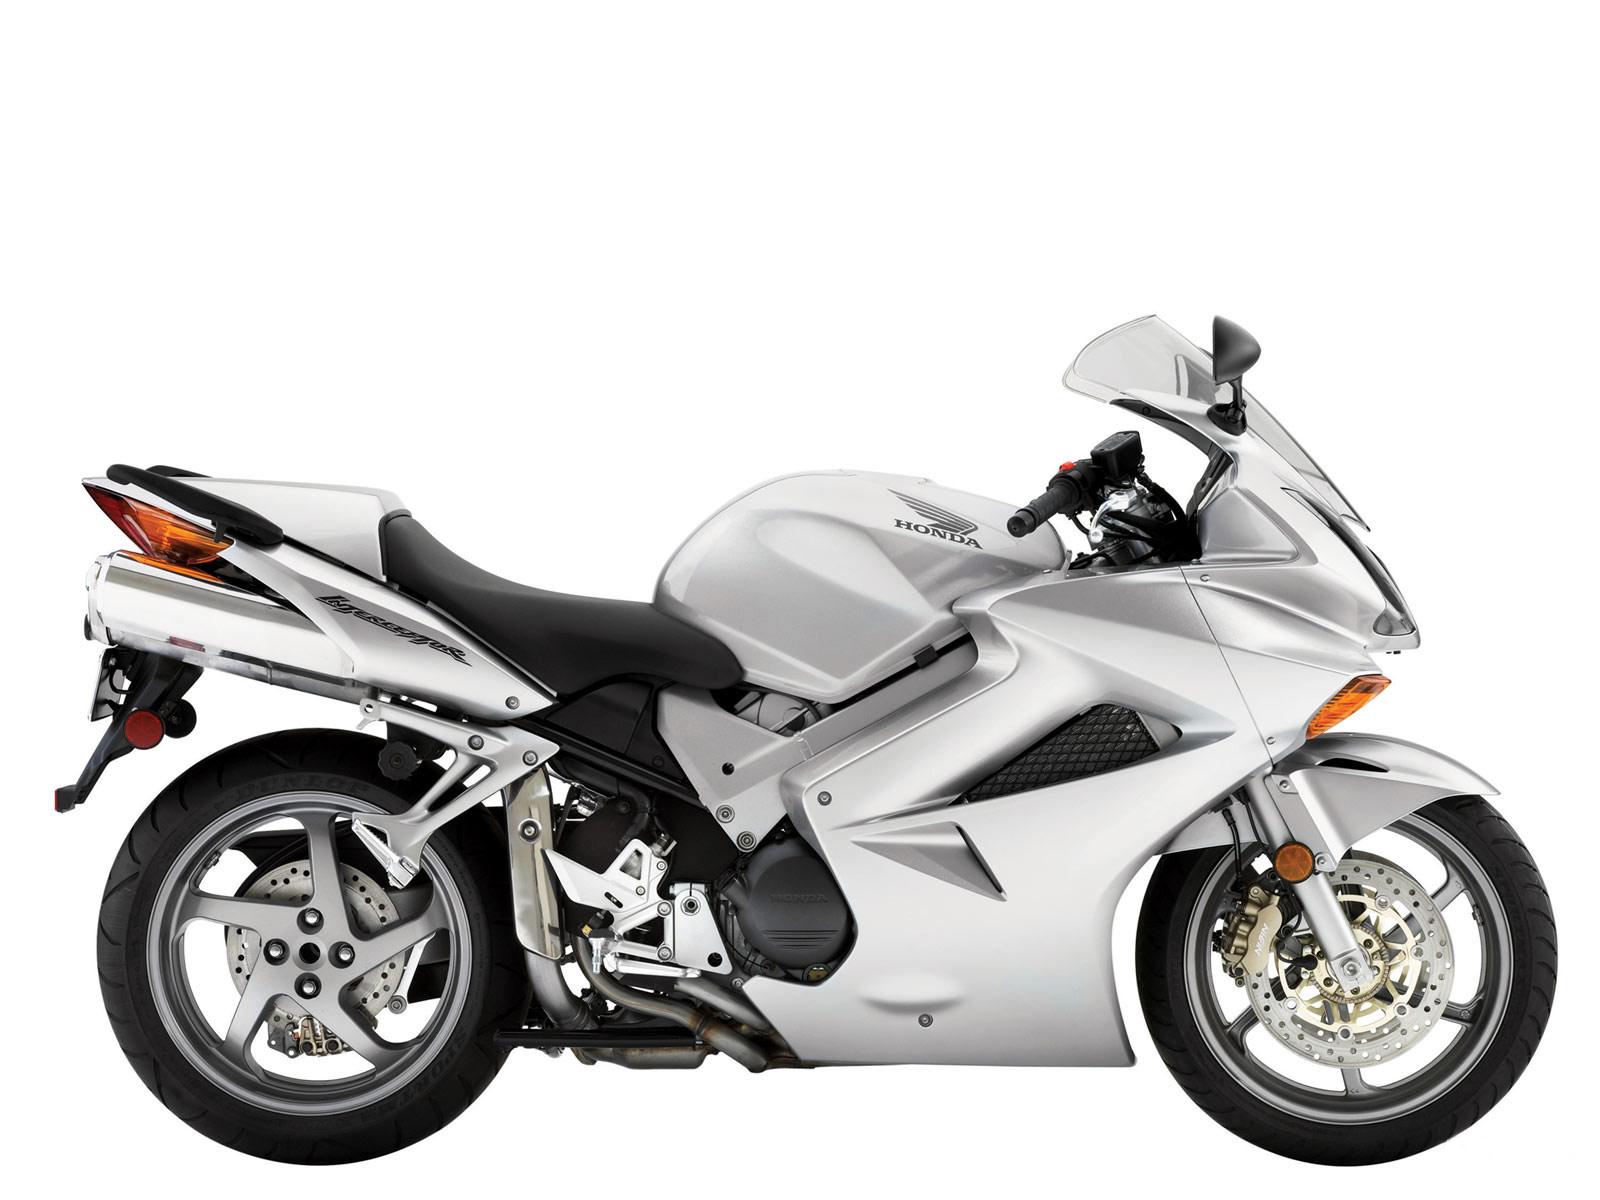 2005 HONDA ST1300 Motorcycle insurance